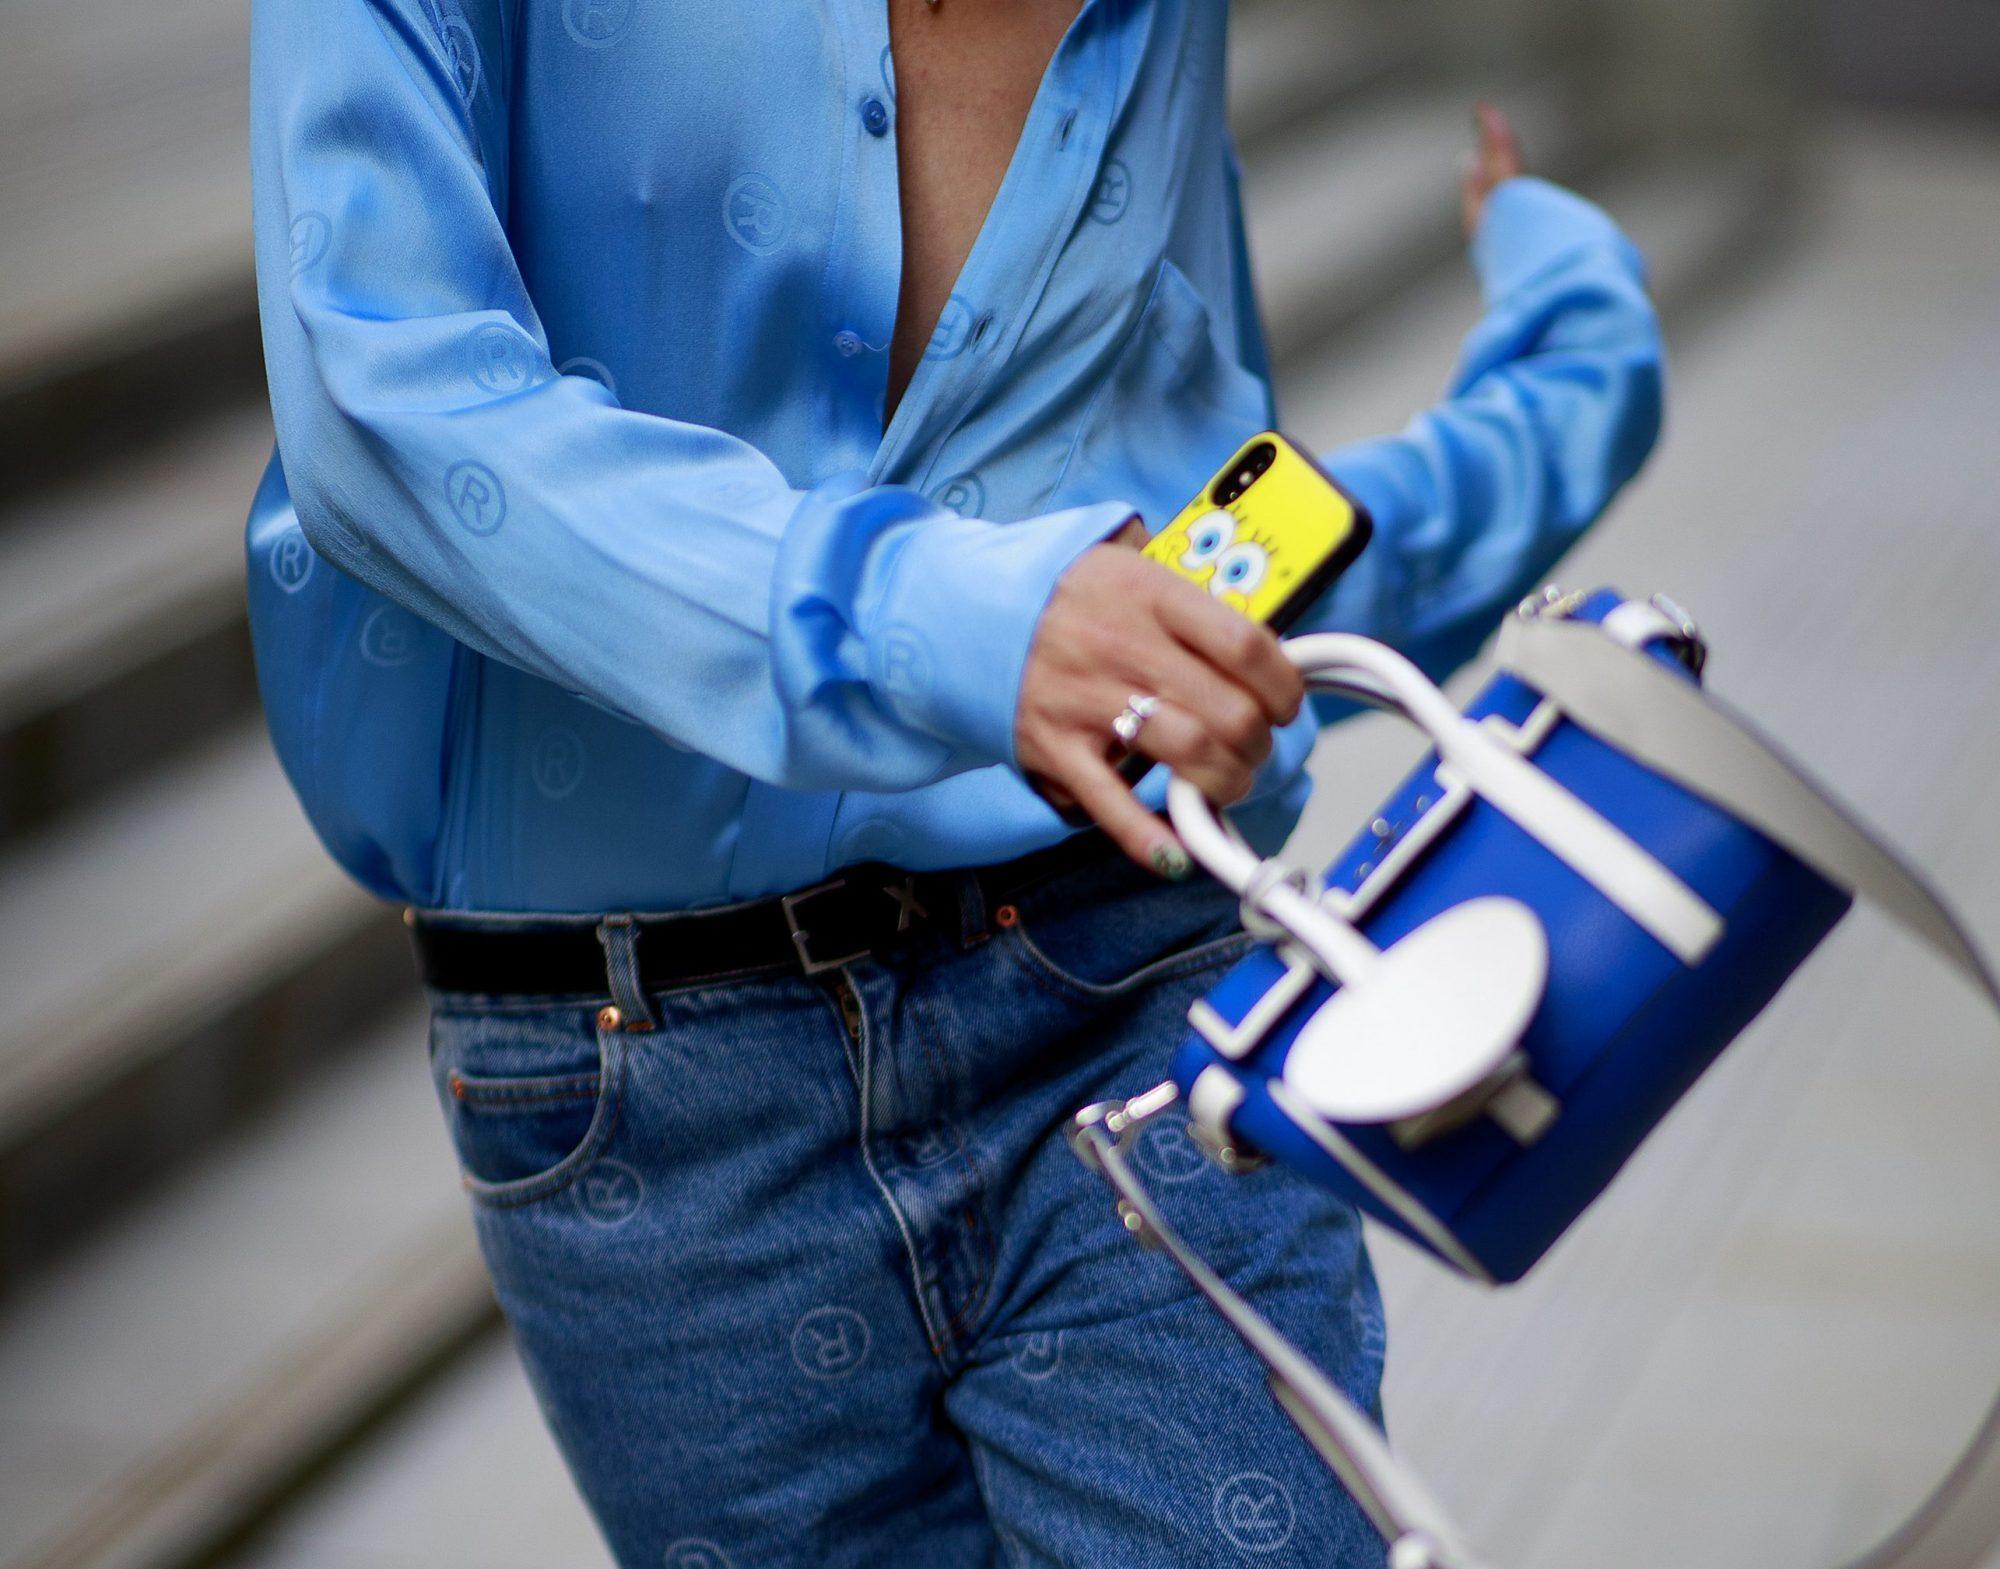 London Fashion Week: Το street style επέστρεψε στην βρετανική πρωτεύουσα και είναι πιο fun από κάθε άλλη φορά